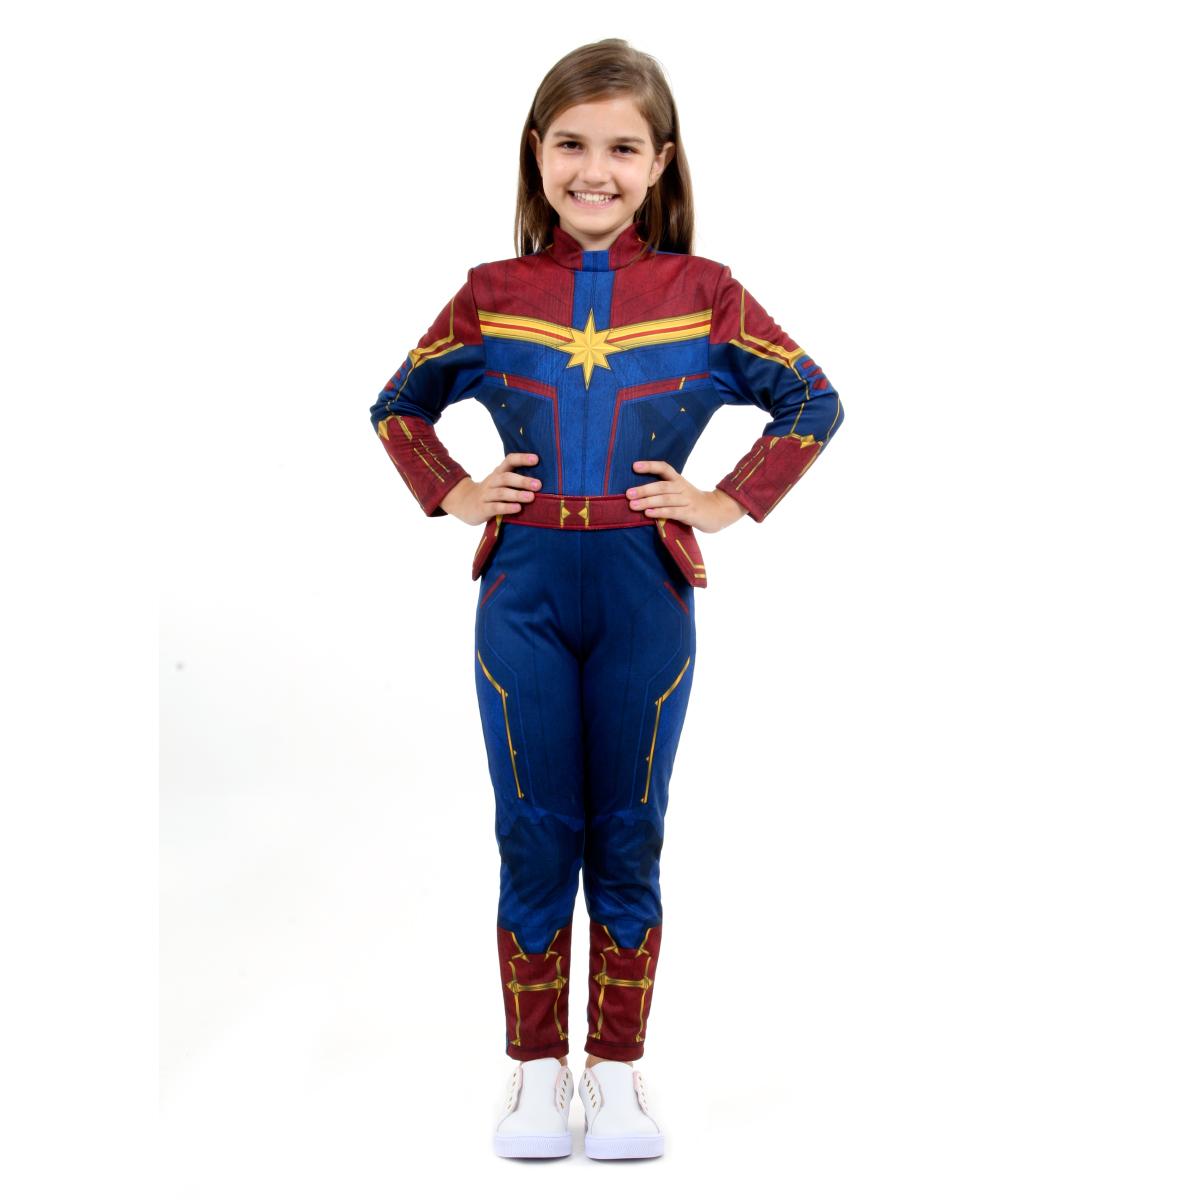 Fantasia Capitã Marvel Infantil Luxo - Captain Marvel - Abrakadabra